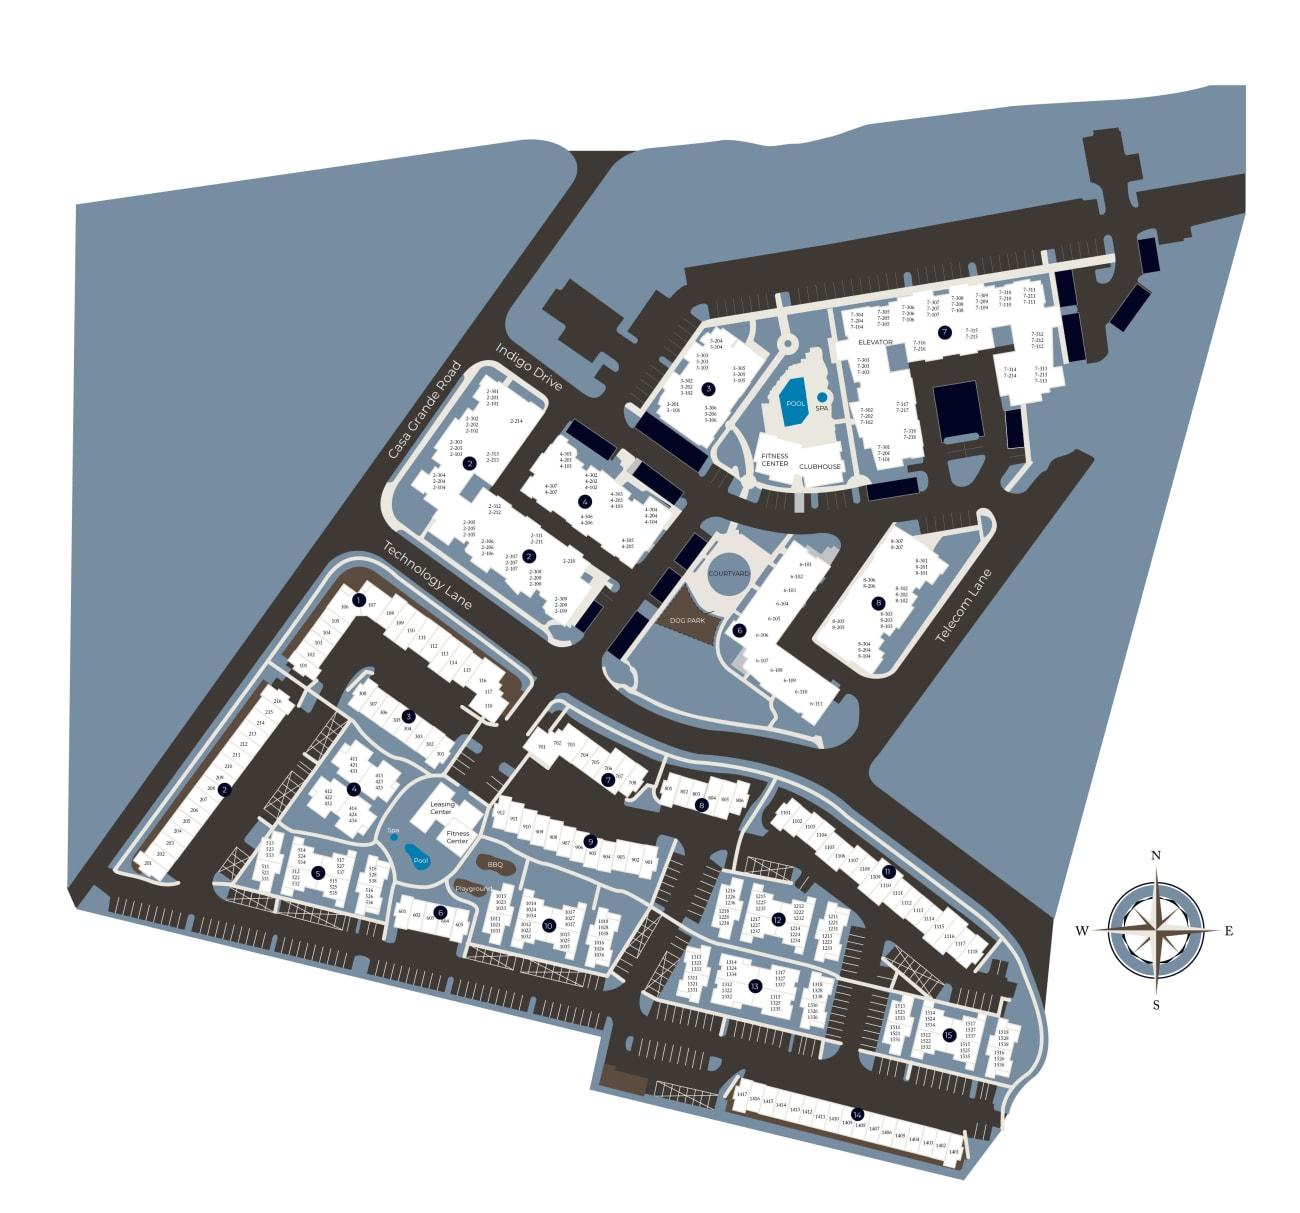 Community site map for Azure Apartment Homes in Petaluma, California